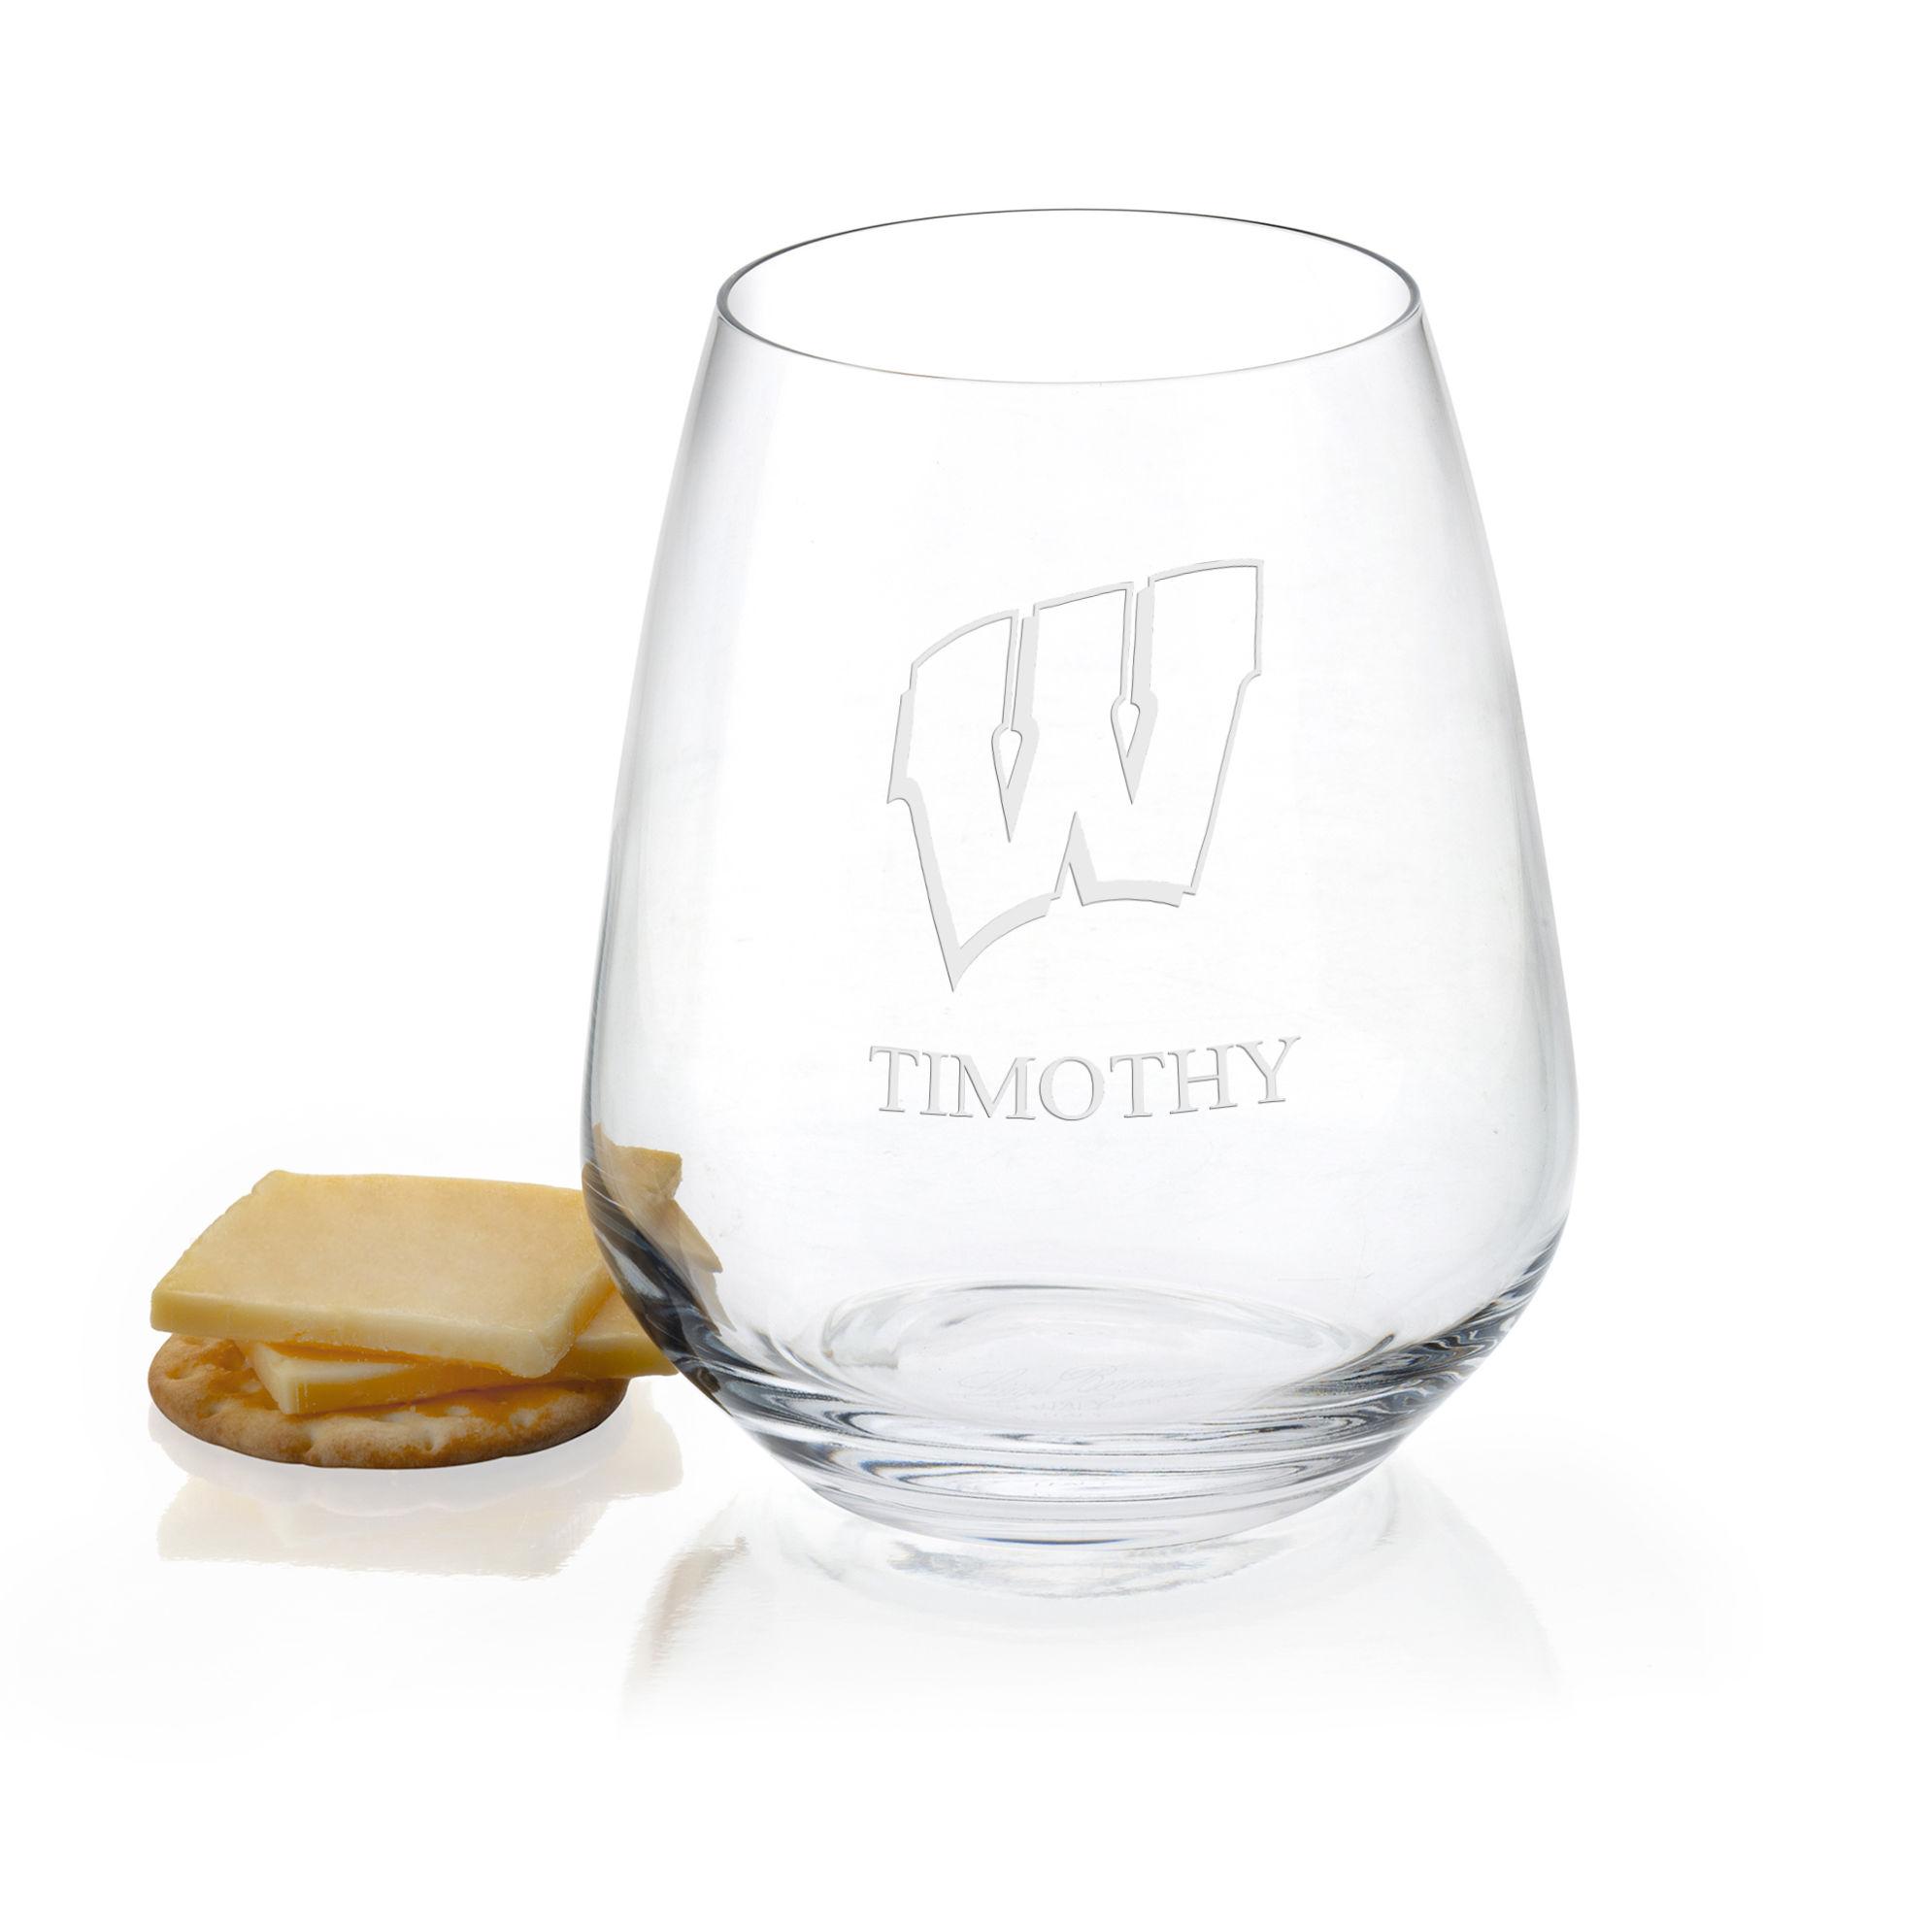 Wisconsin Stemless Wine Glasses - Set of 4